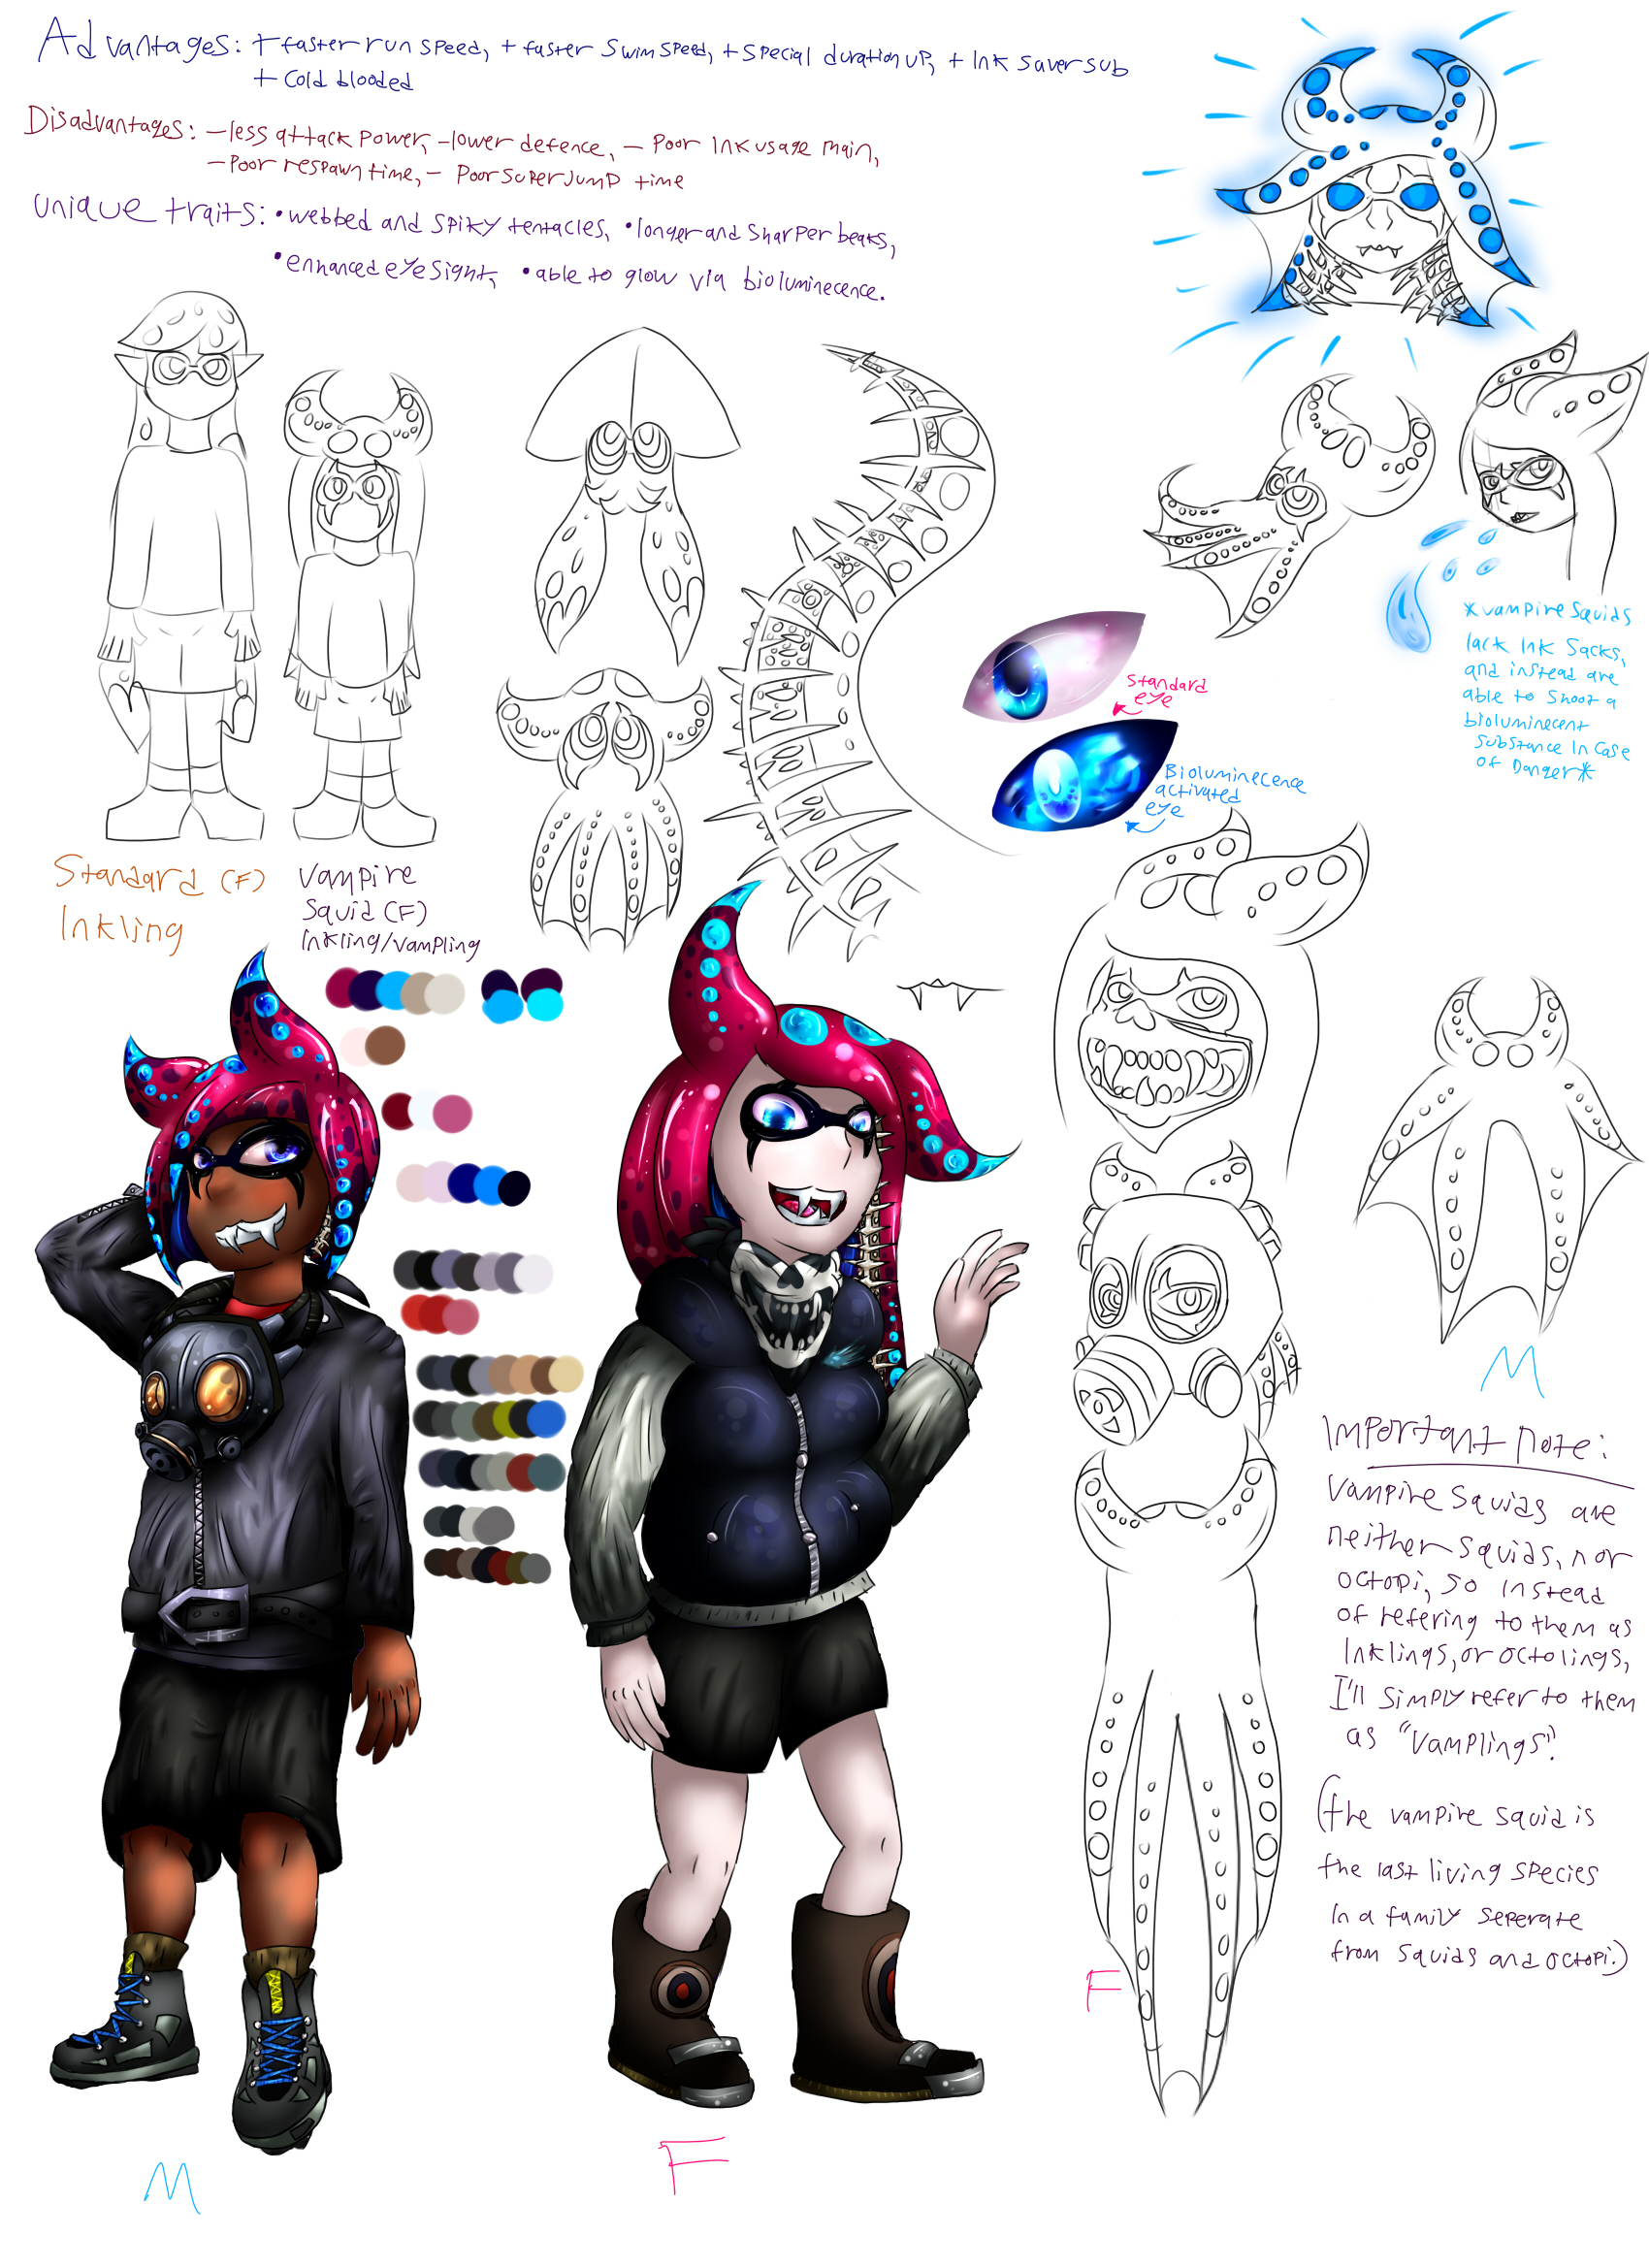 Vampire Squid Inklings Concept Art — Weasyl